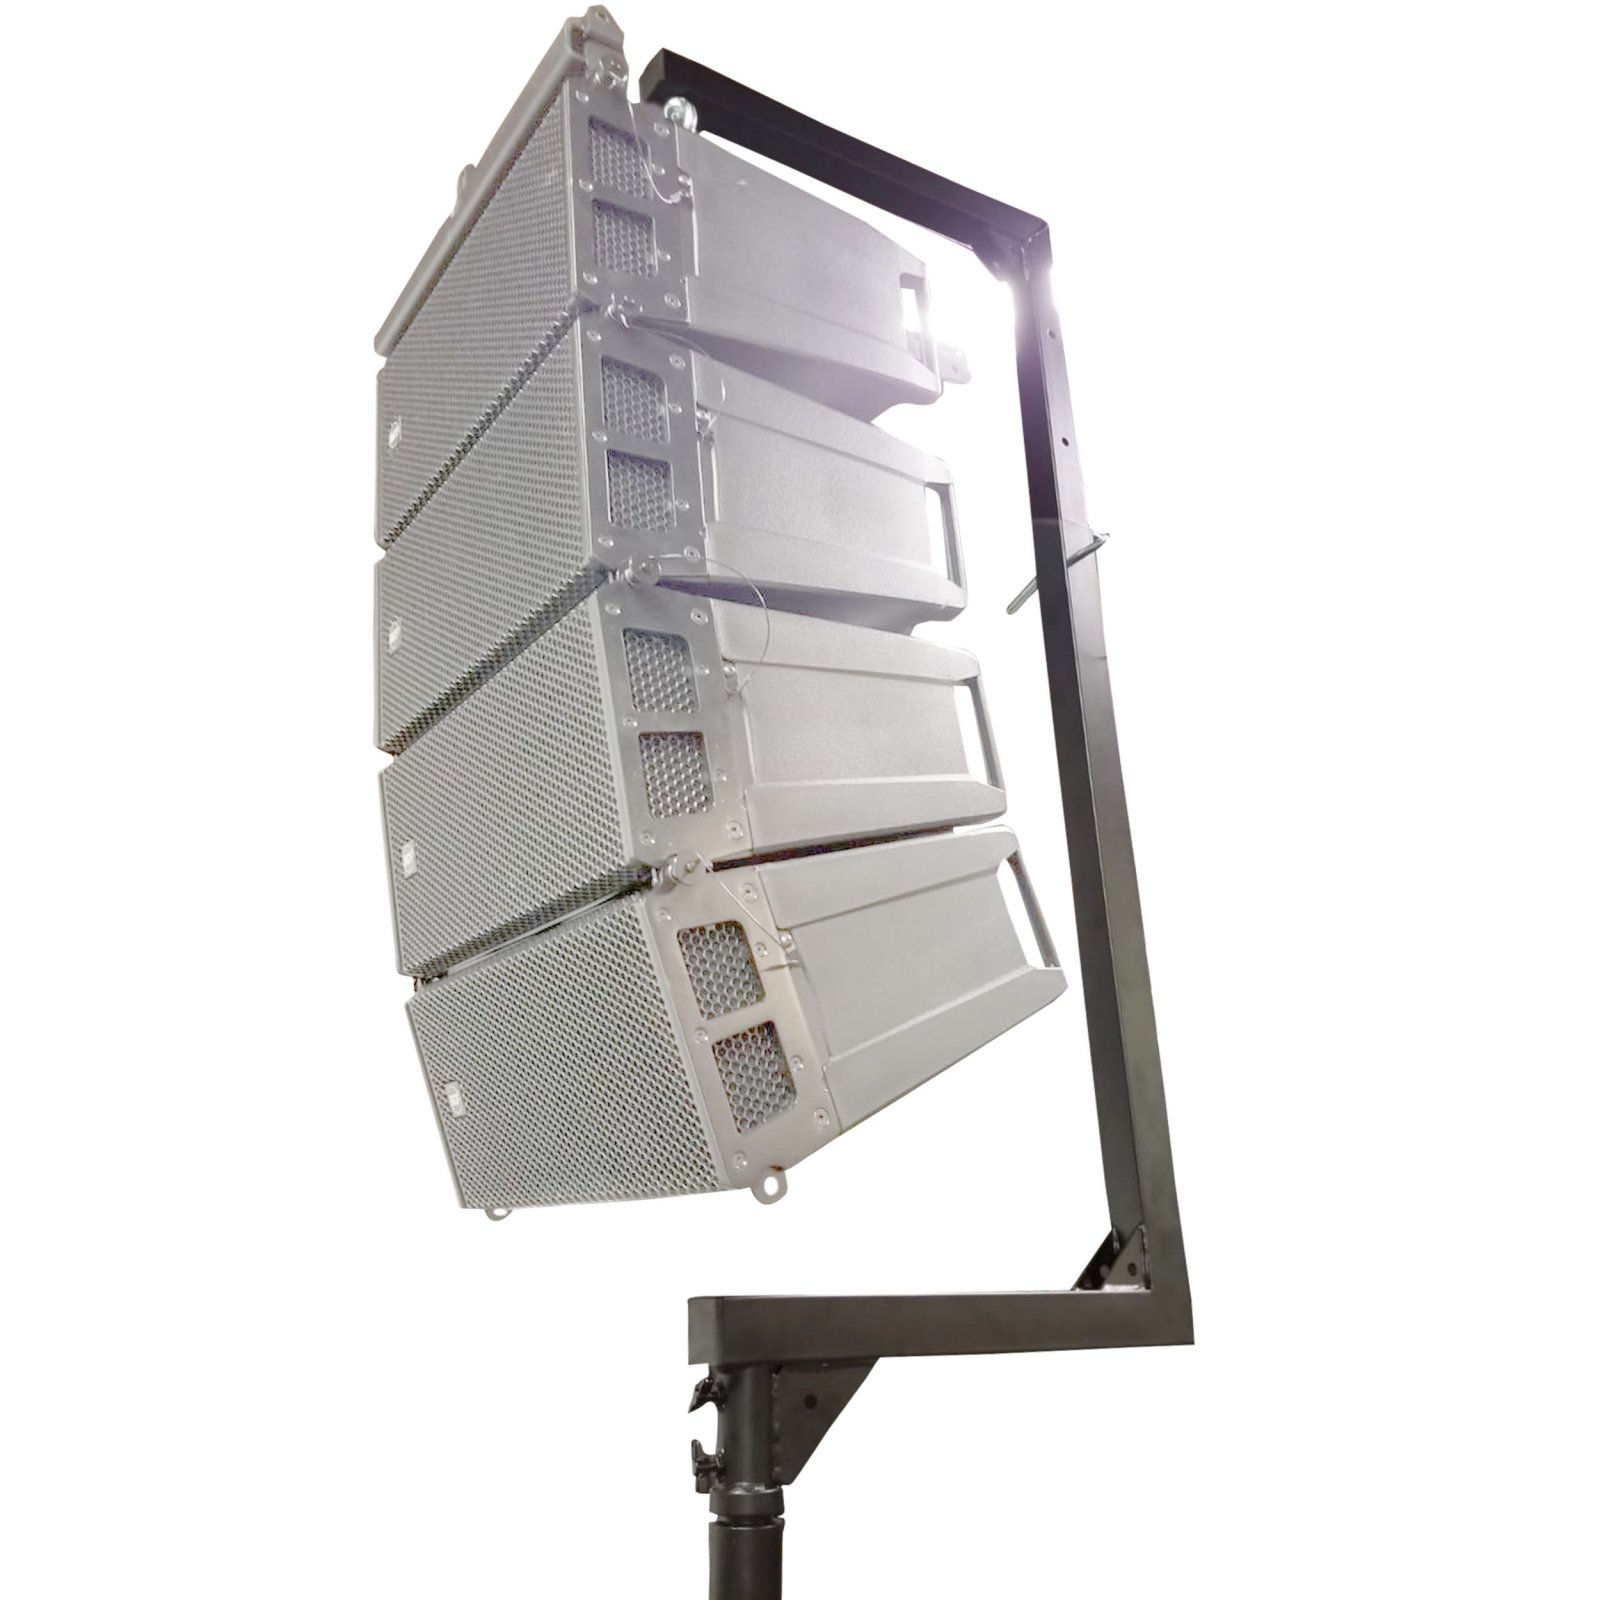 ProX XT-LA567 Universal Crank Stand Mount for Line Array Speakers - Maximum Load of 250 lbs